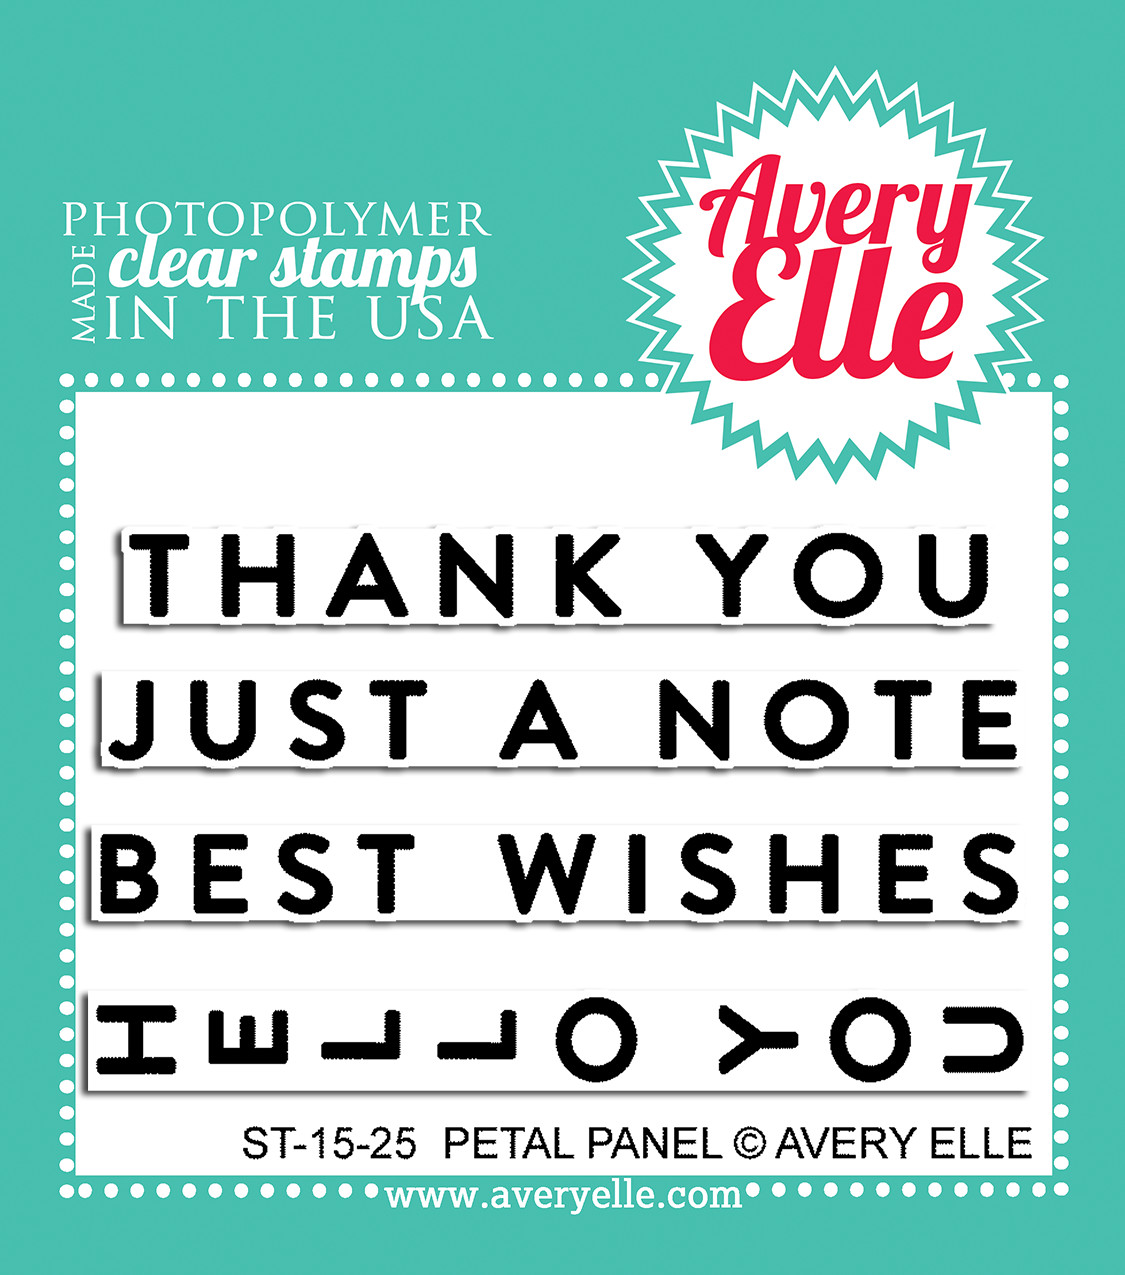 Avery Elle PETAL PANEL Clear Stamp Set